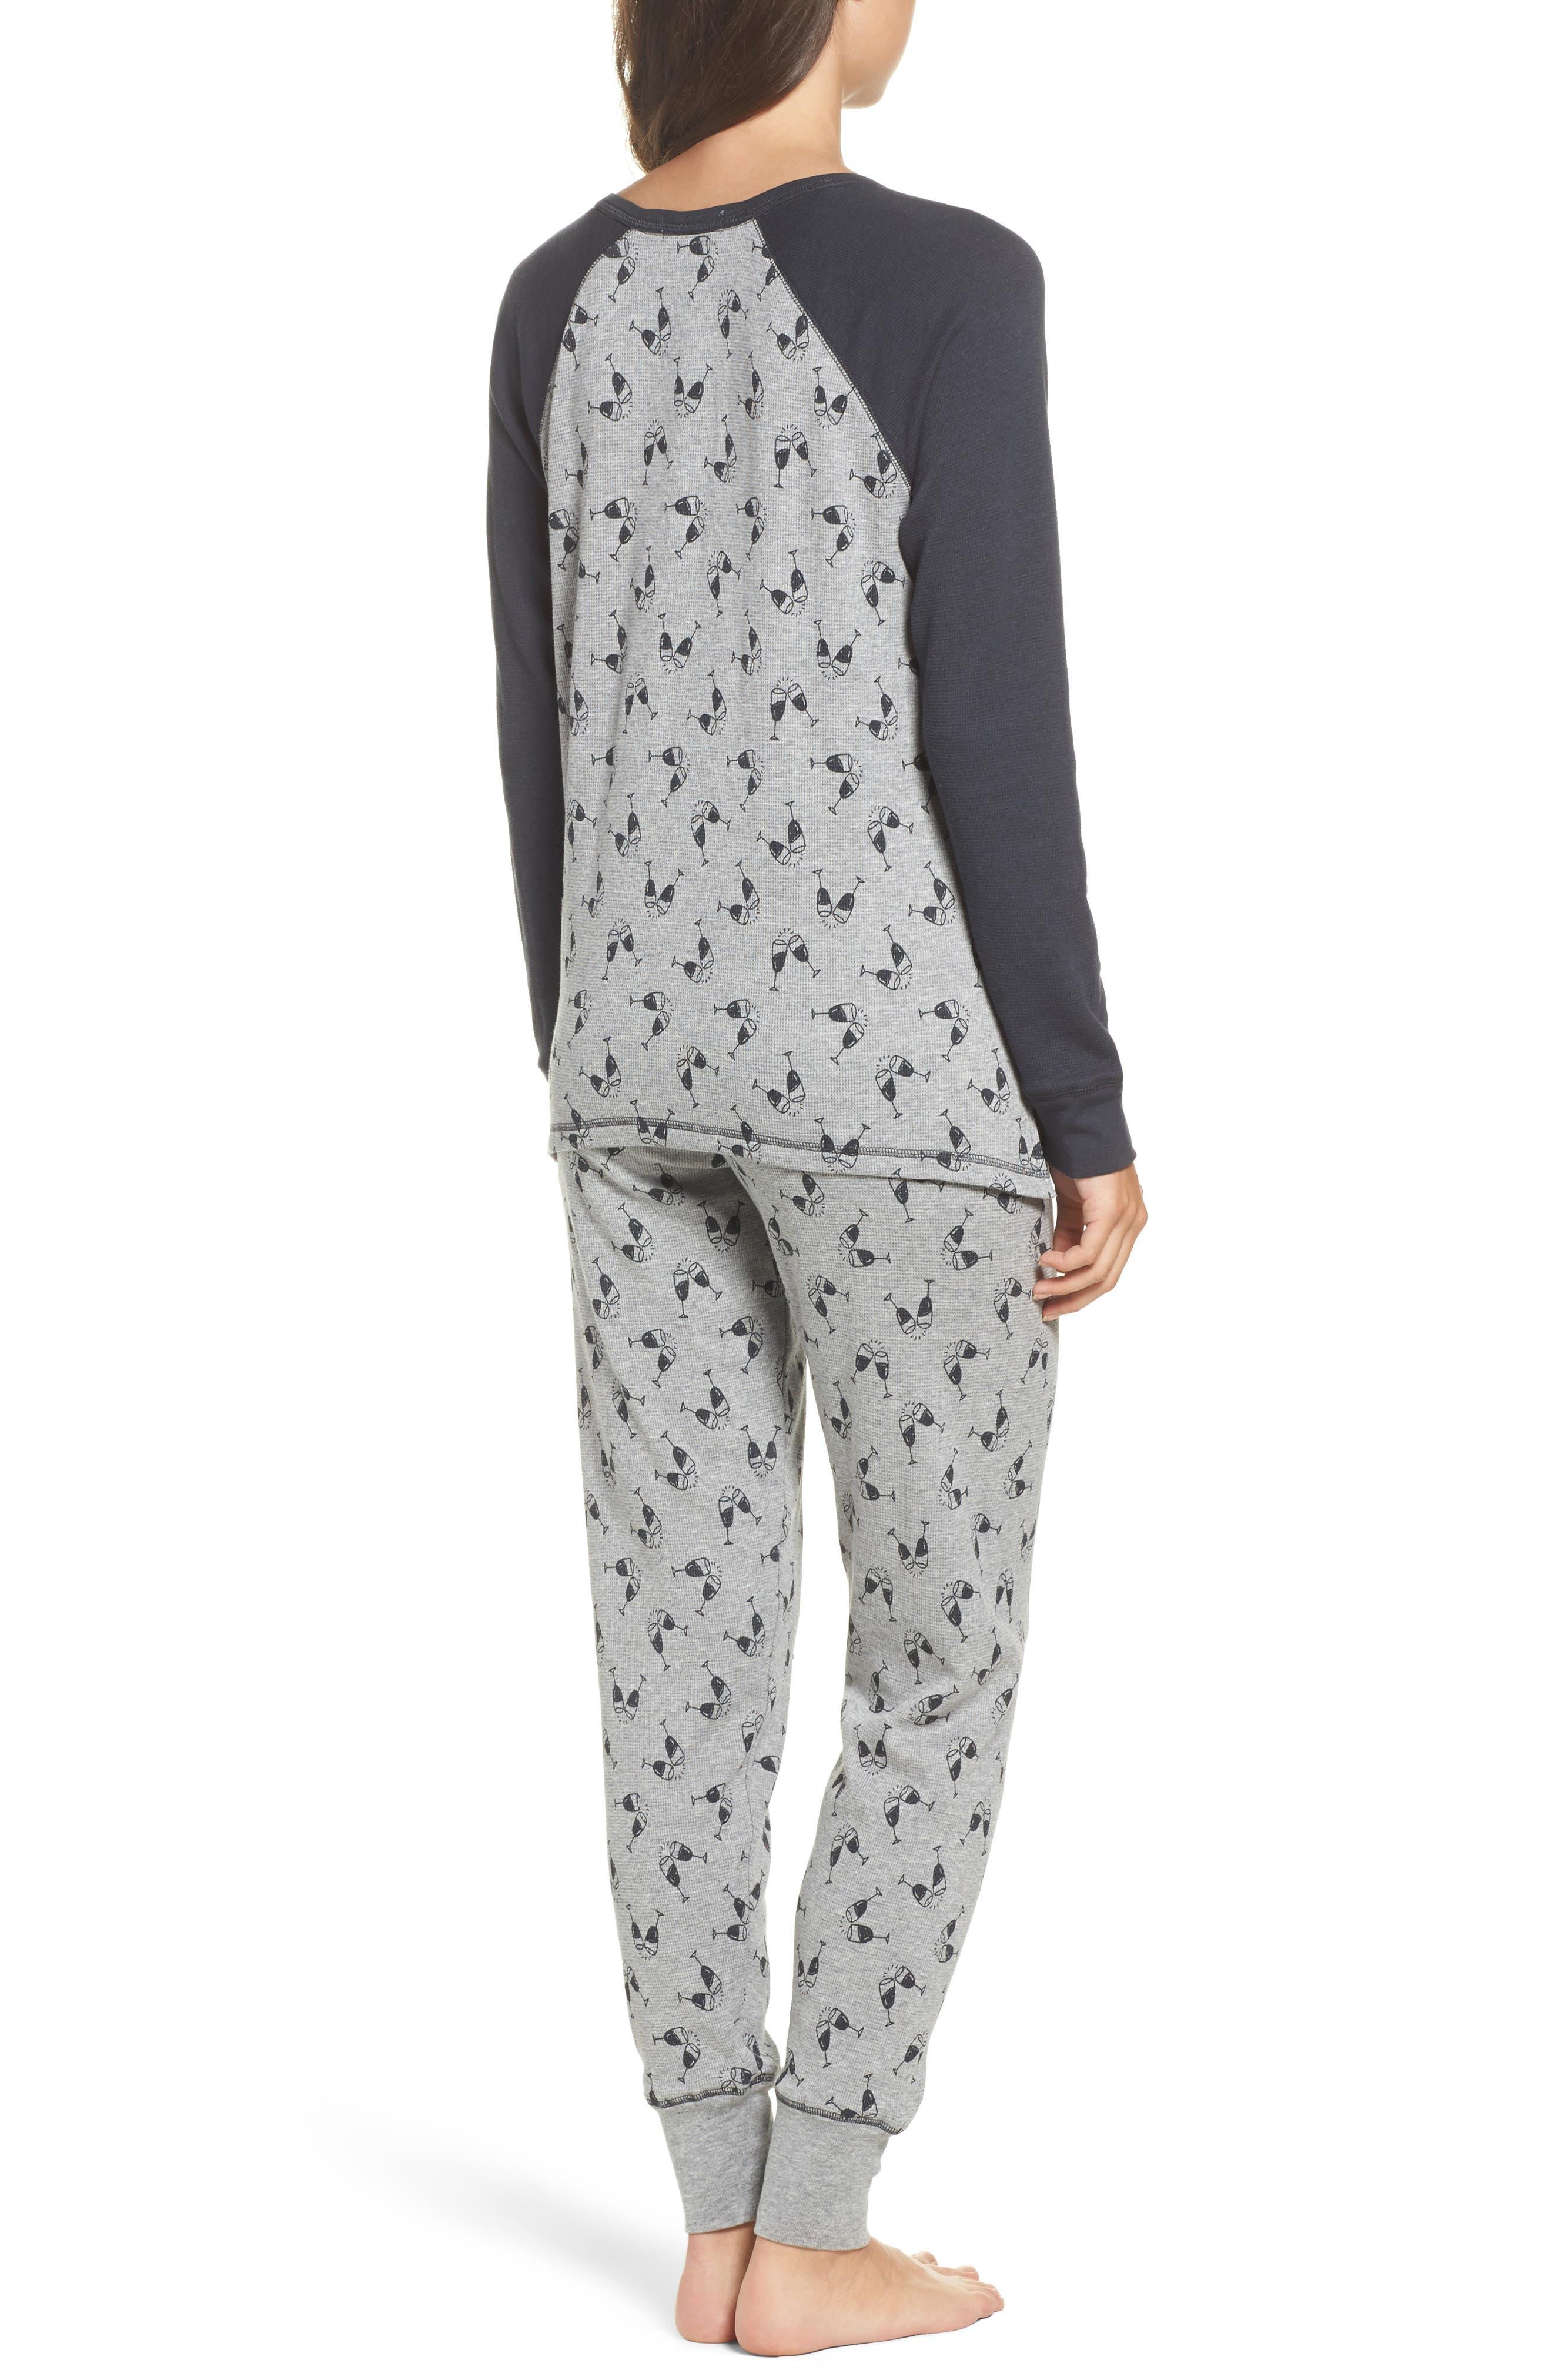 PJ Salvage Womens Printed Henley Placket Drawstring Waist Thermal Pajamas Set M